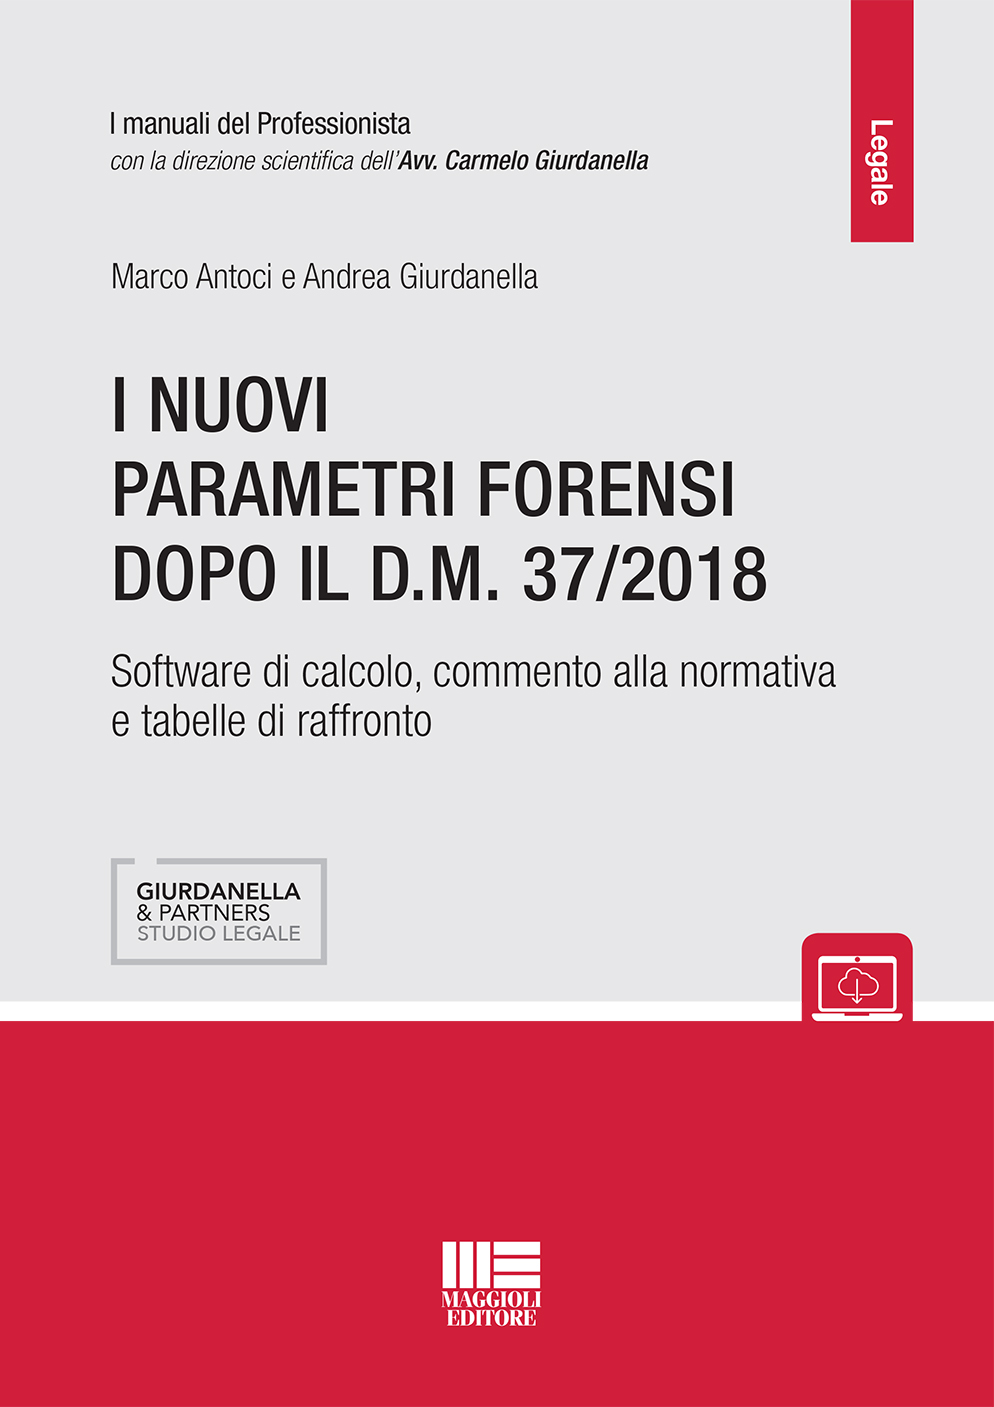 I nuovi parametri forensi dopo il D.M. 37/2018